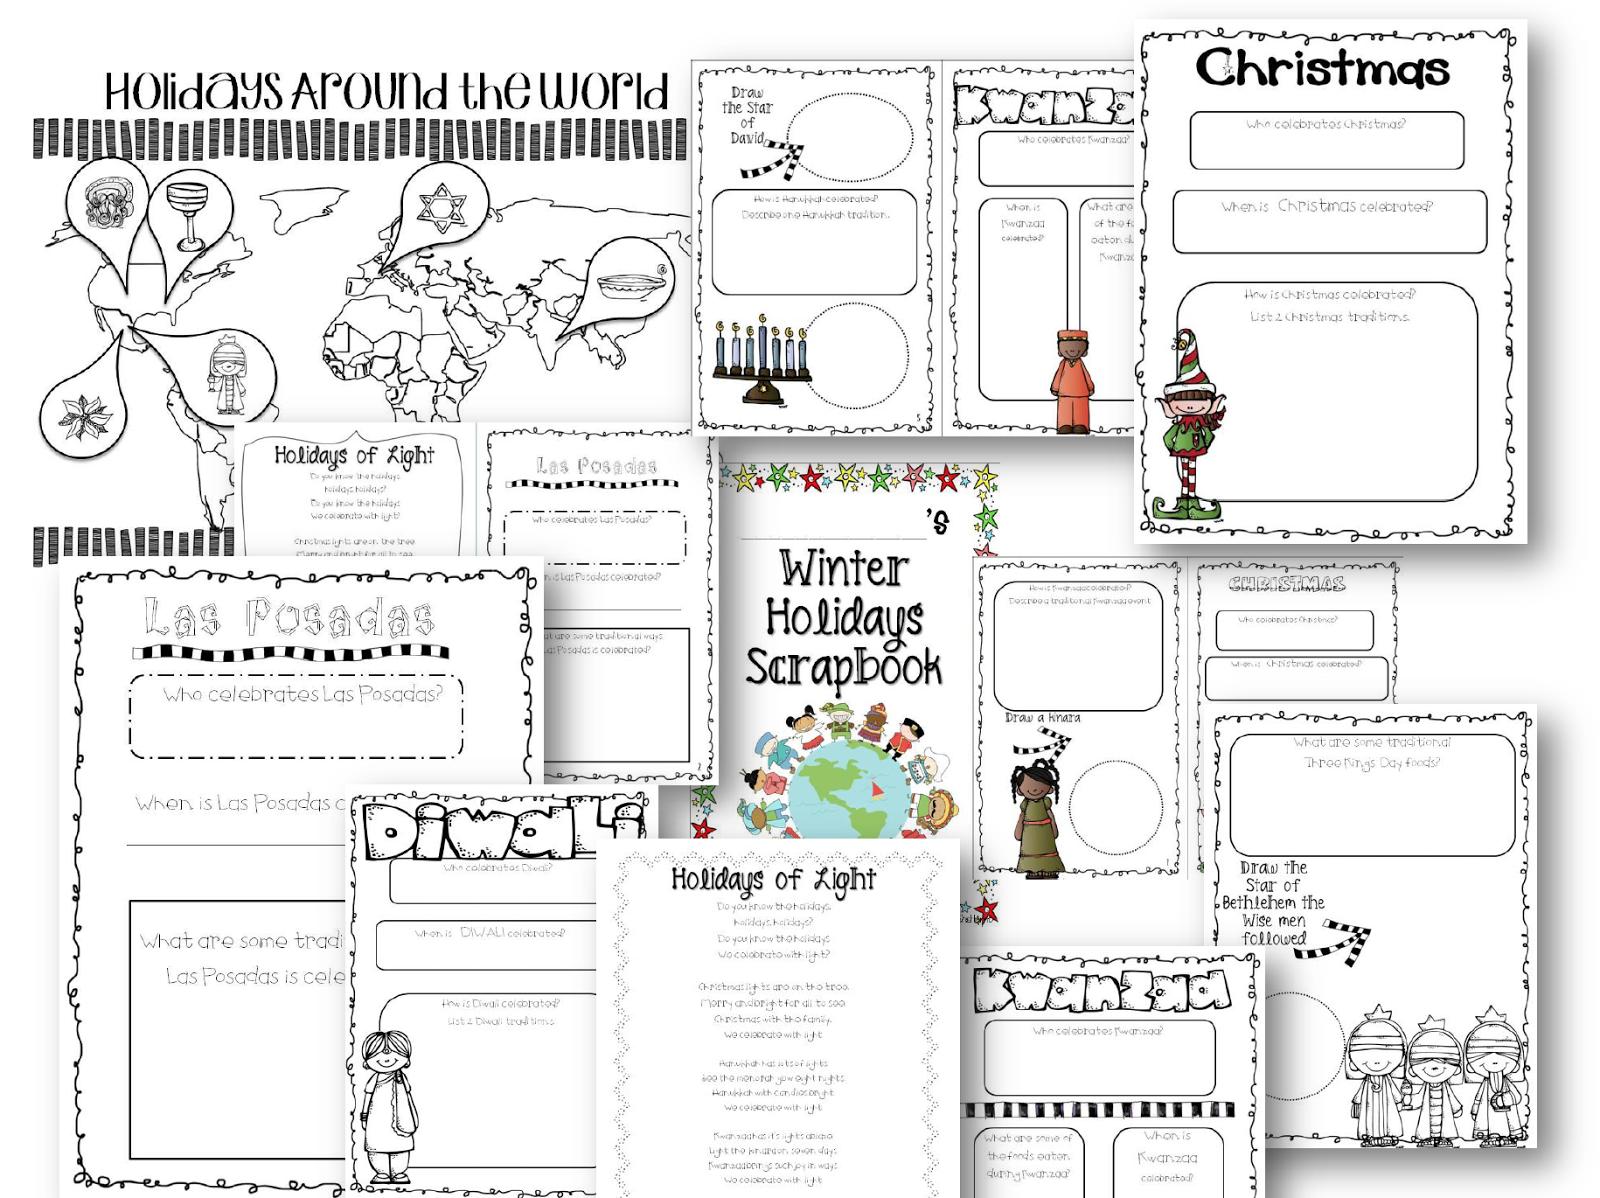 Workbooks las posadas worksheets : Blog Hoppin': November 2013